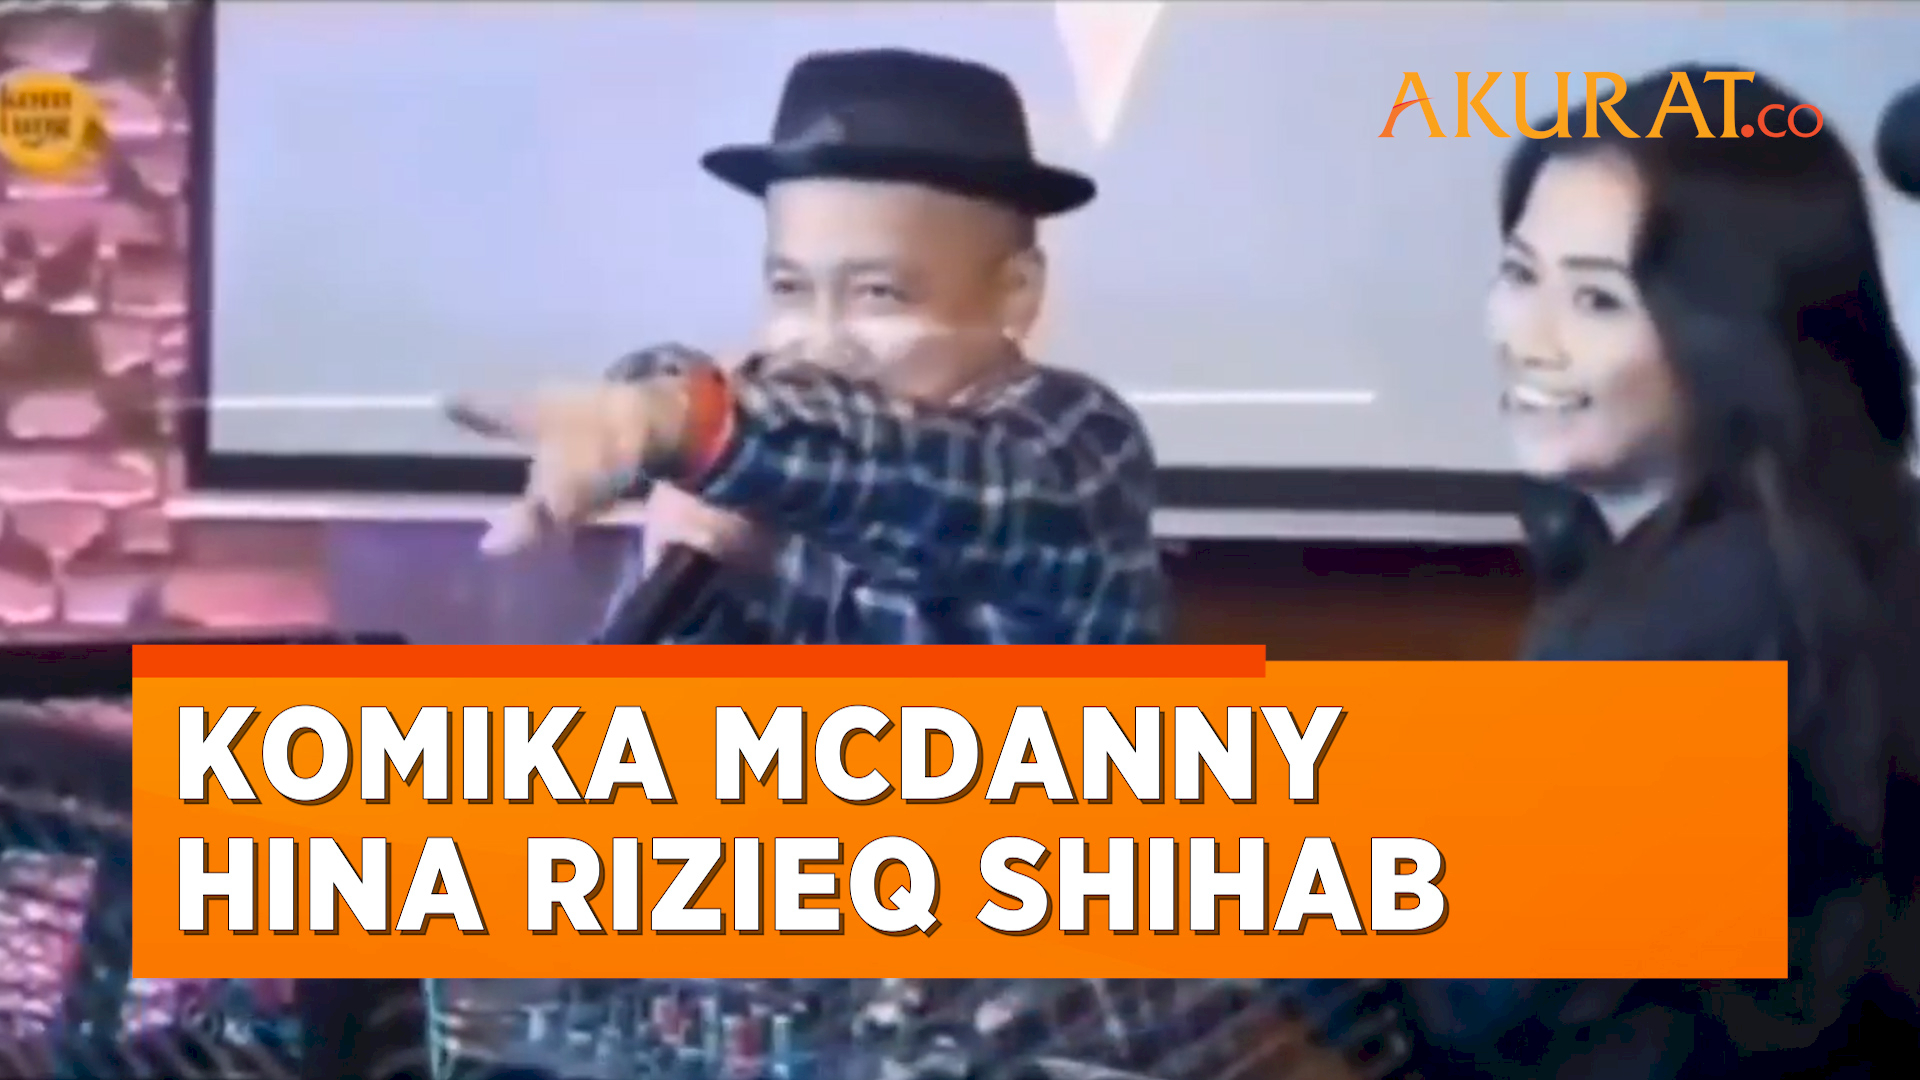 Hampir Menangis, Komika McDanny Minta Maaf Usai Kedapatan Hina Rizieq Shihab